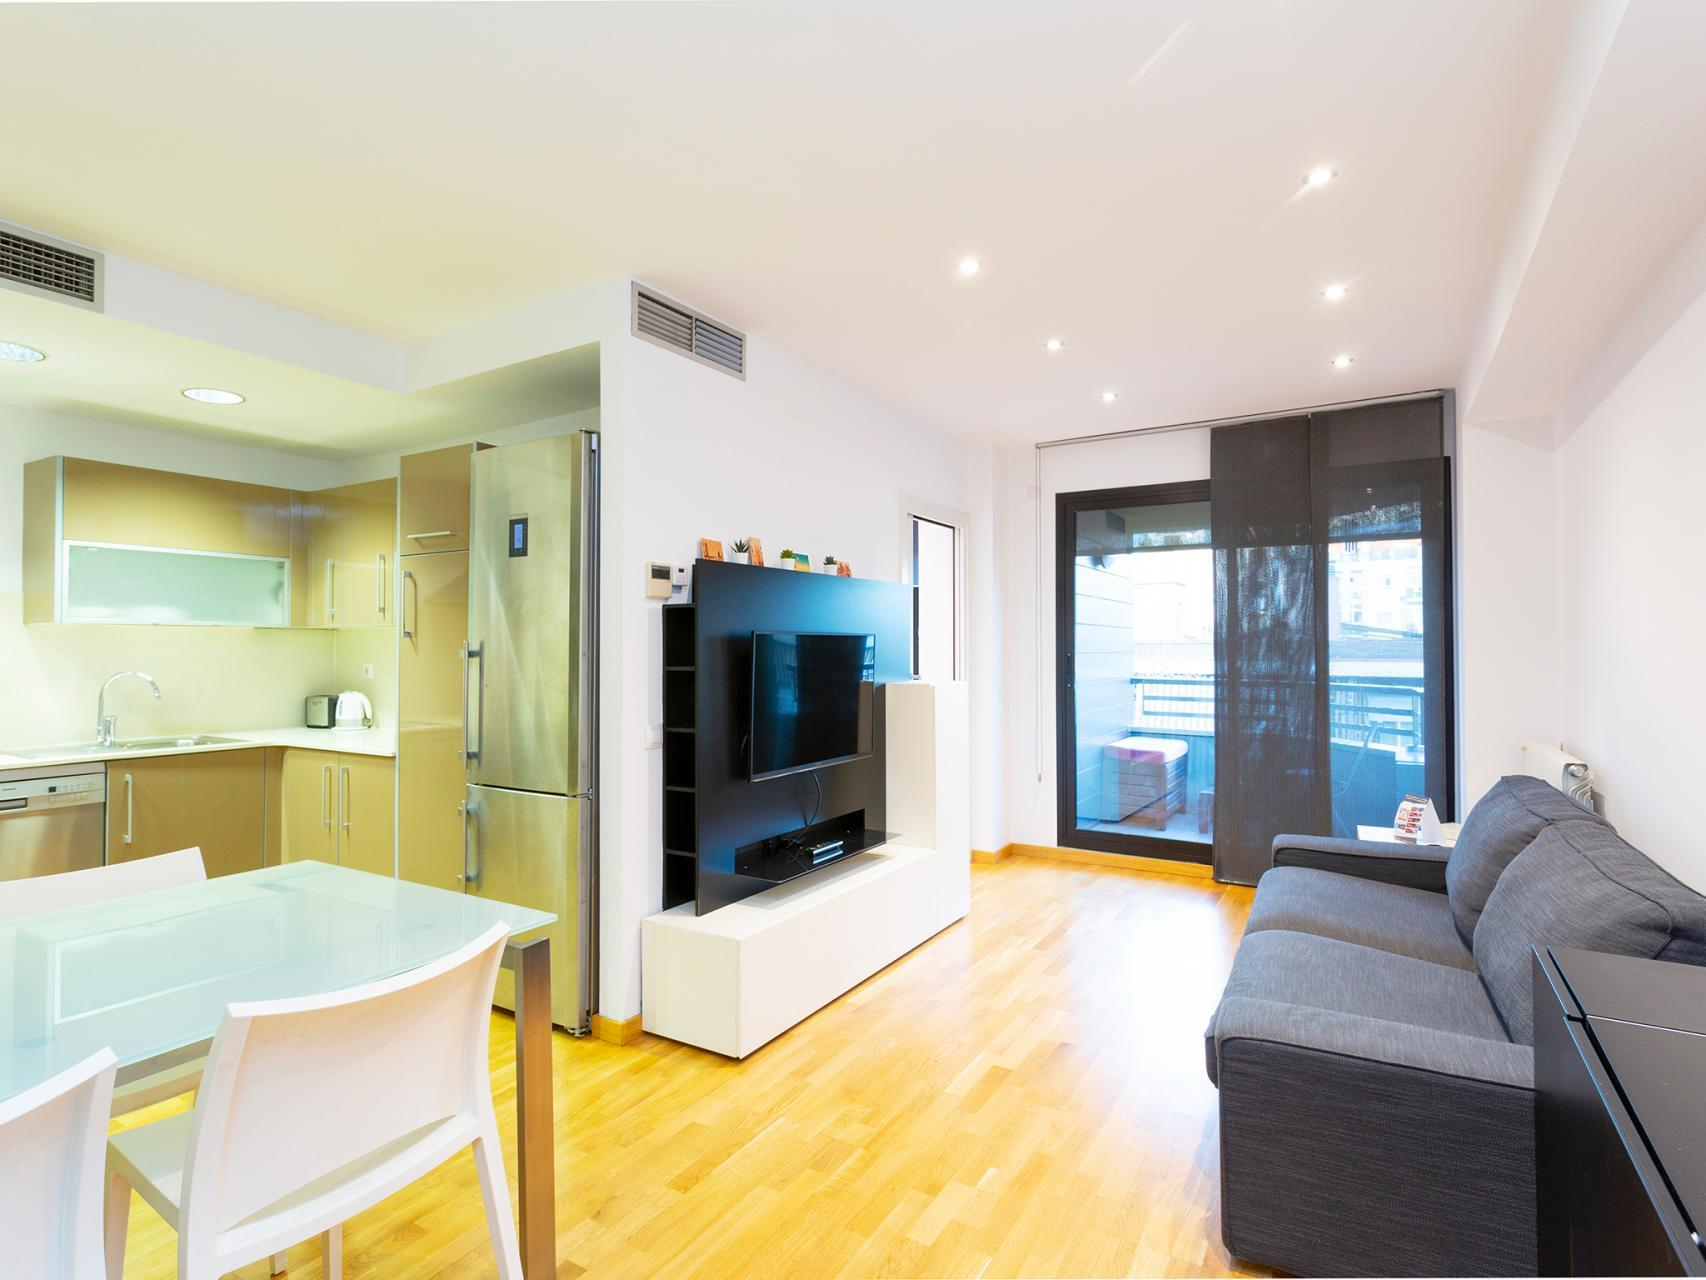 Piso en Barcelona - vila olimpica. Balc�n.3 bedrooms. For sale: 575.000 €.